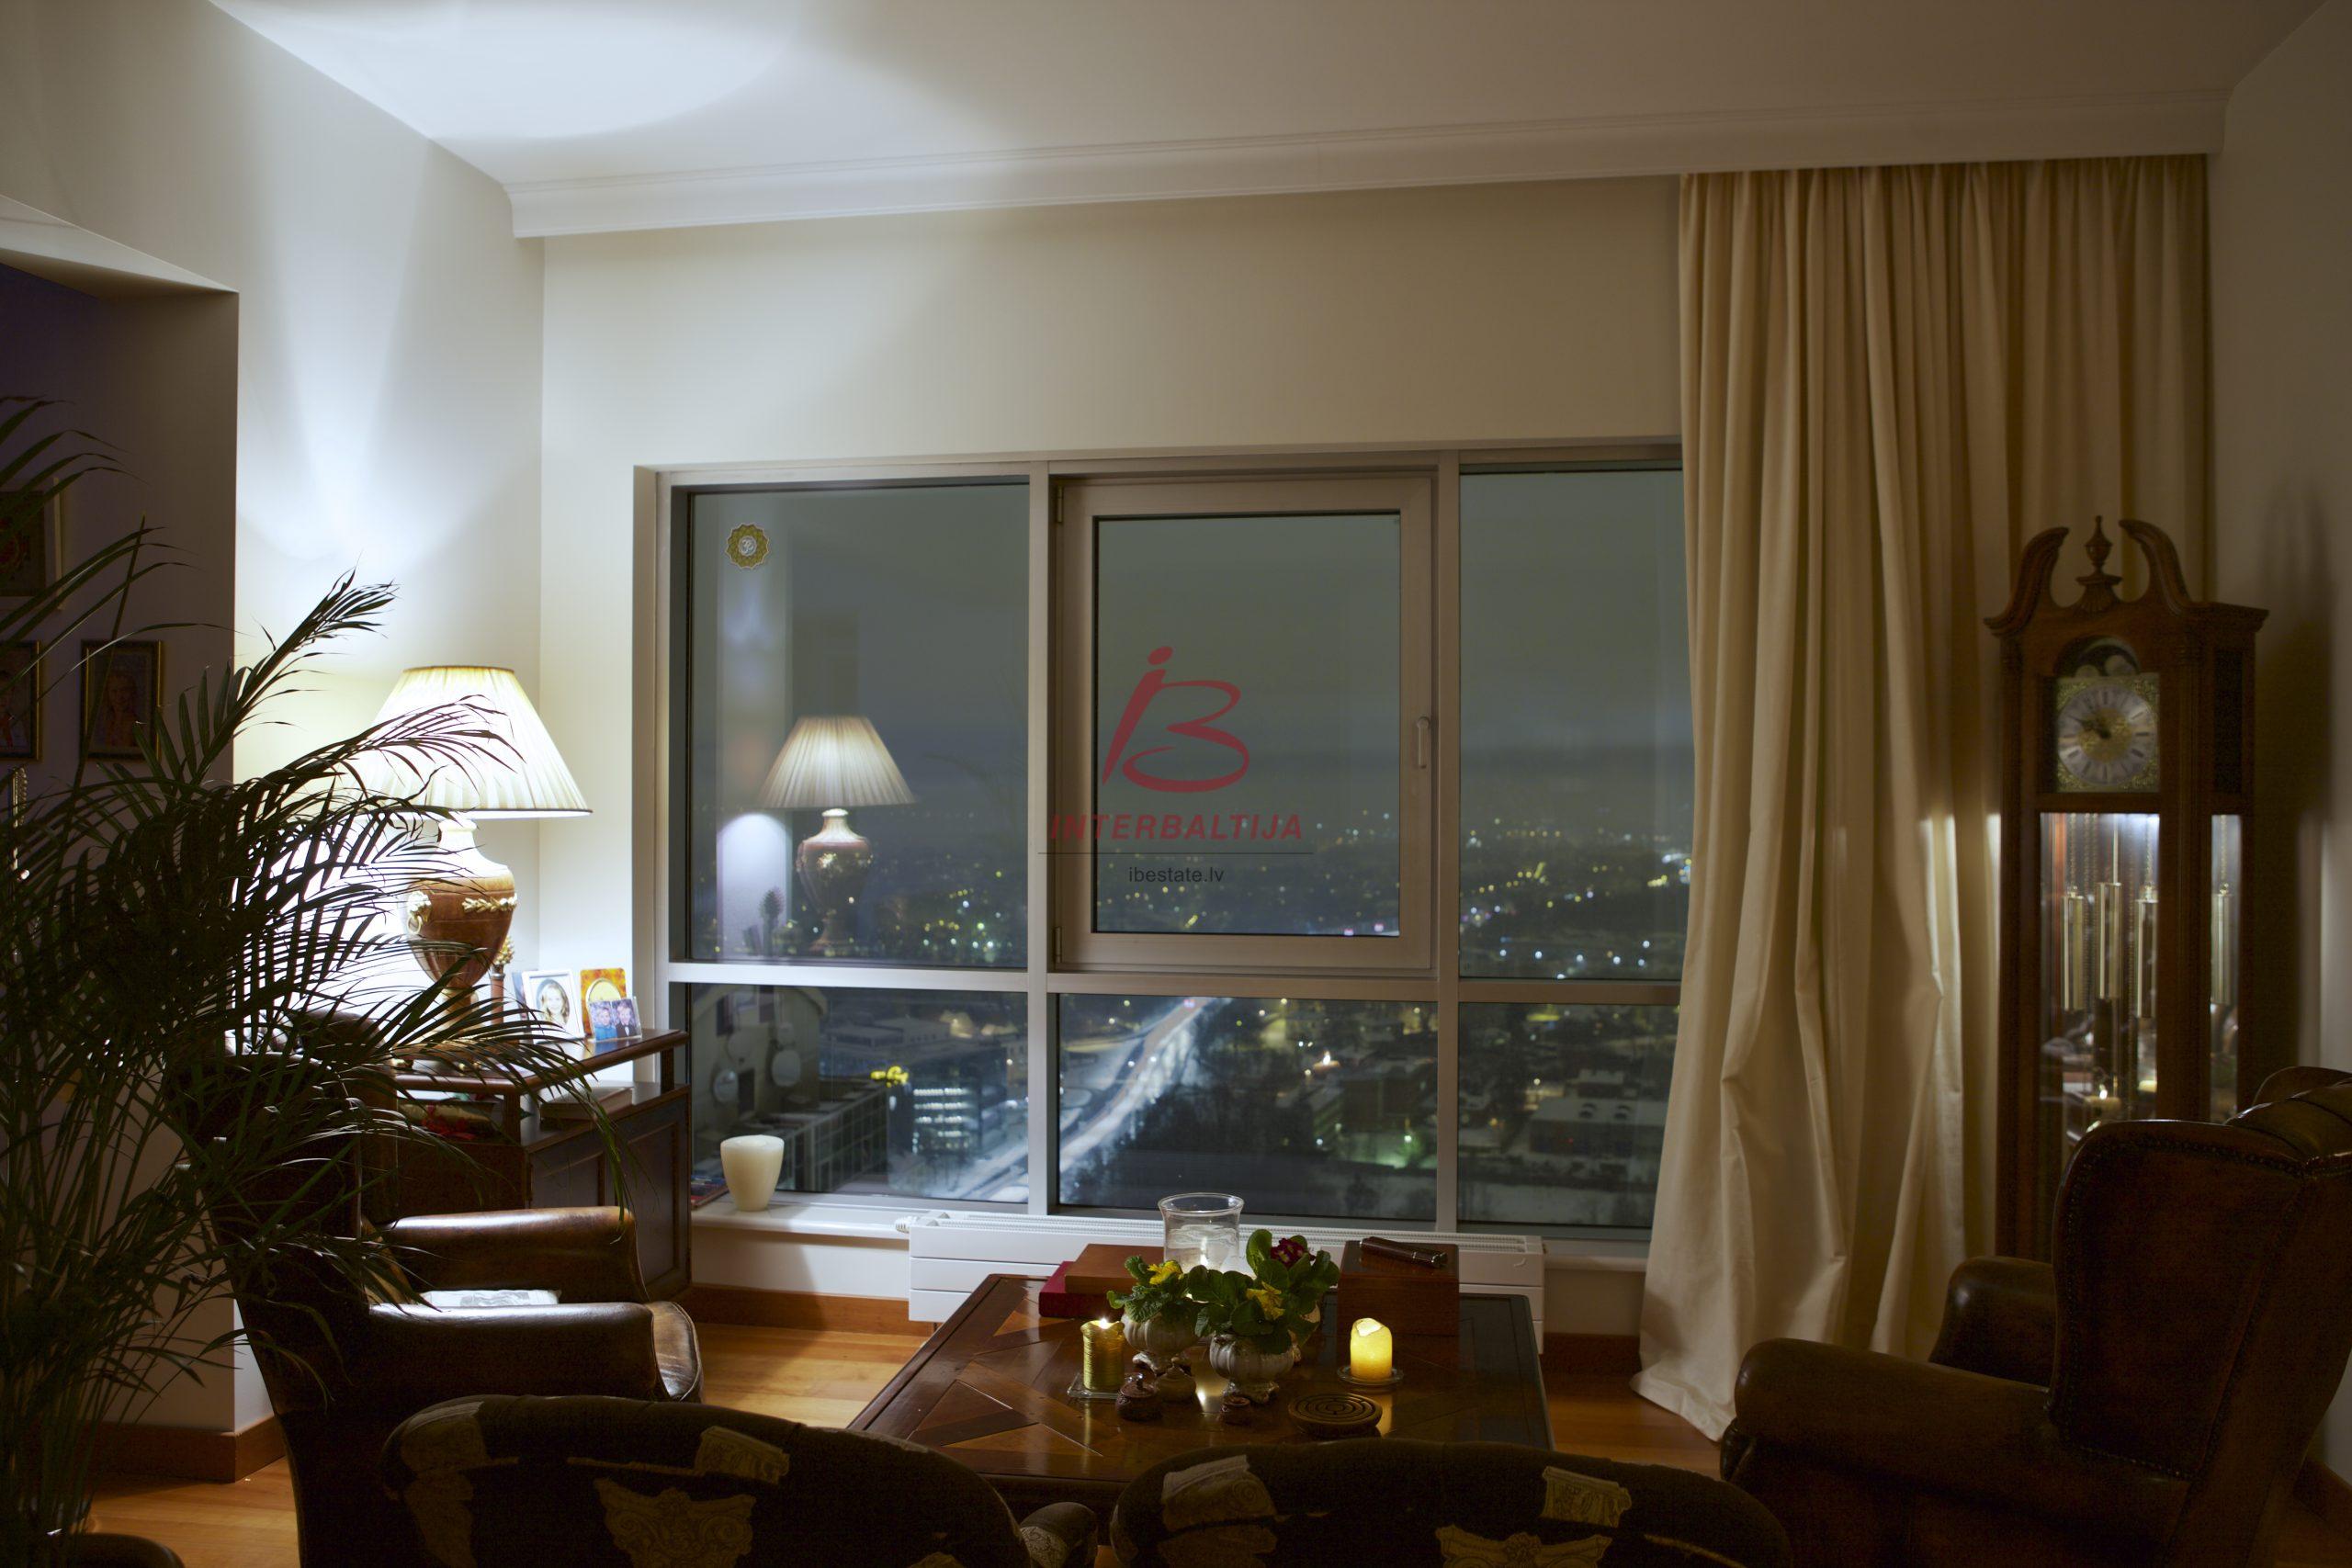 30. Stāva penthouse dzīvoklis, Rīga